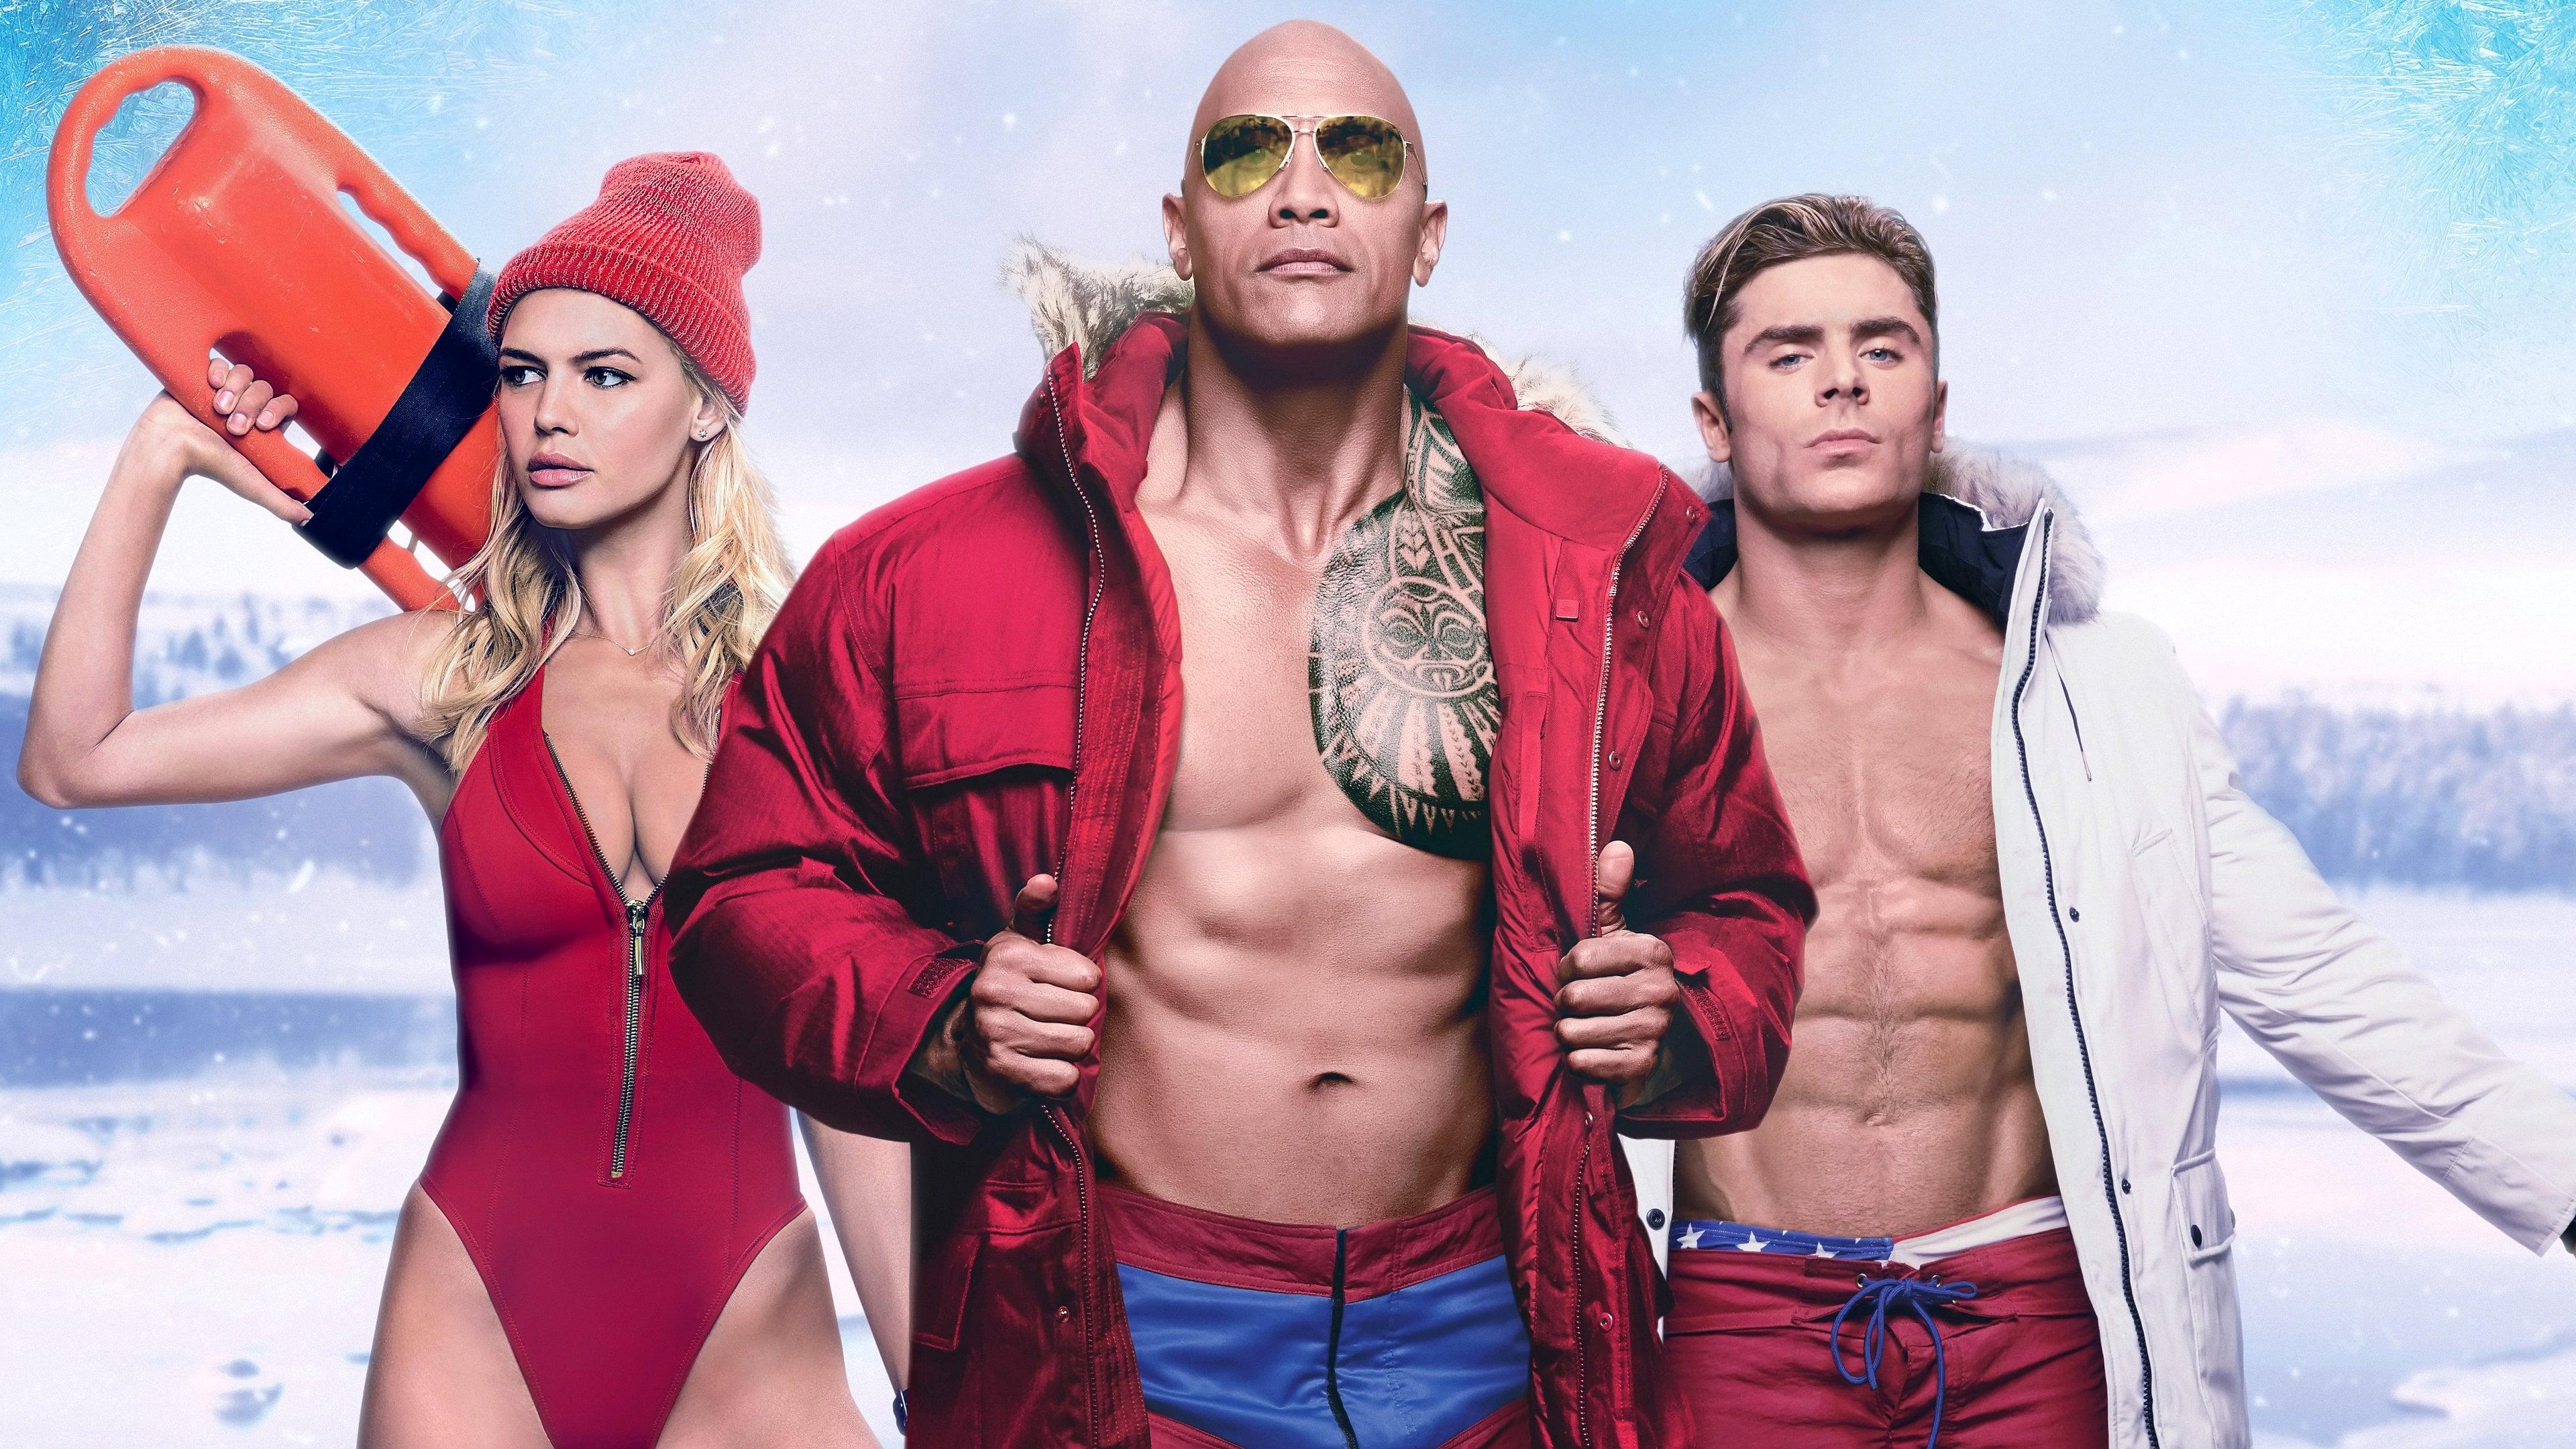 baywatch full movie hd online 123movies